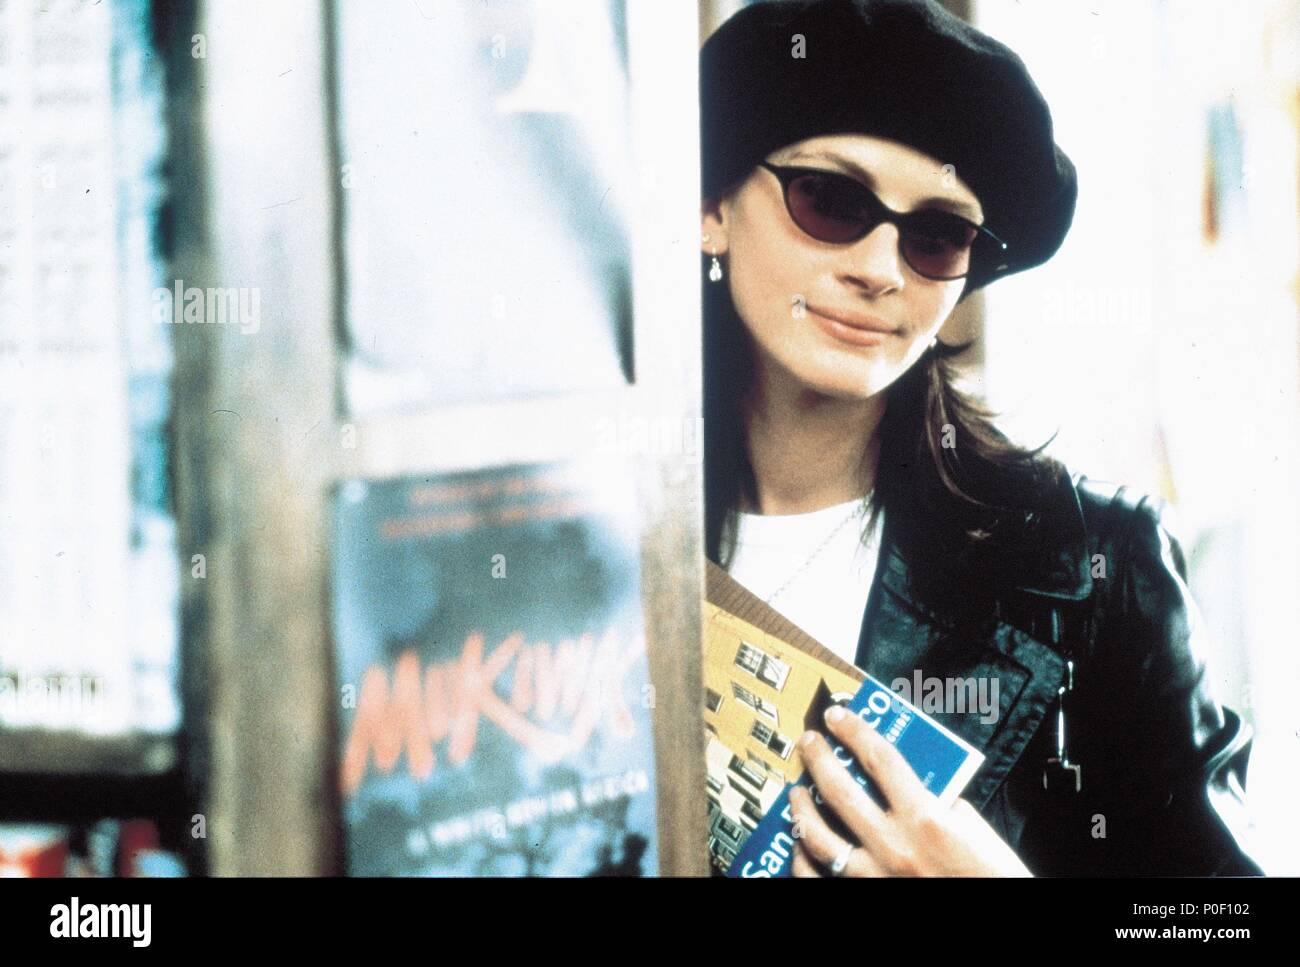 Original Film Title: NOTTING HILL.  English Title: NOTTING HILL.  Film Director: ROGER MICHELL.  Year: 1999.  Stars: JULIA ROBERTS. Credit: POLYGRAM / Album - Stock Image